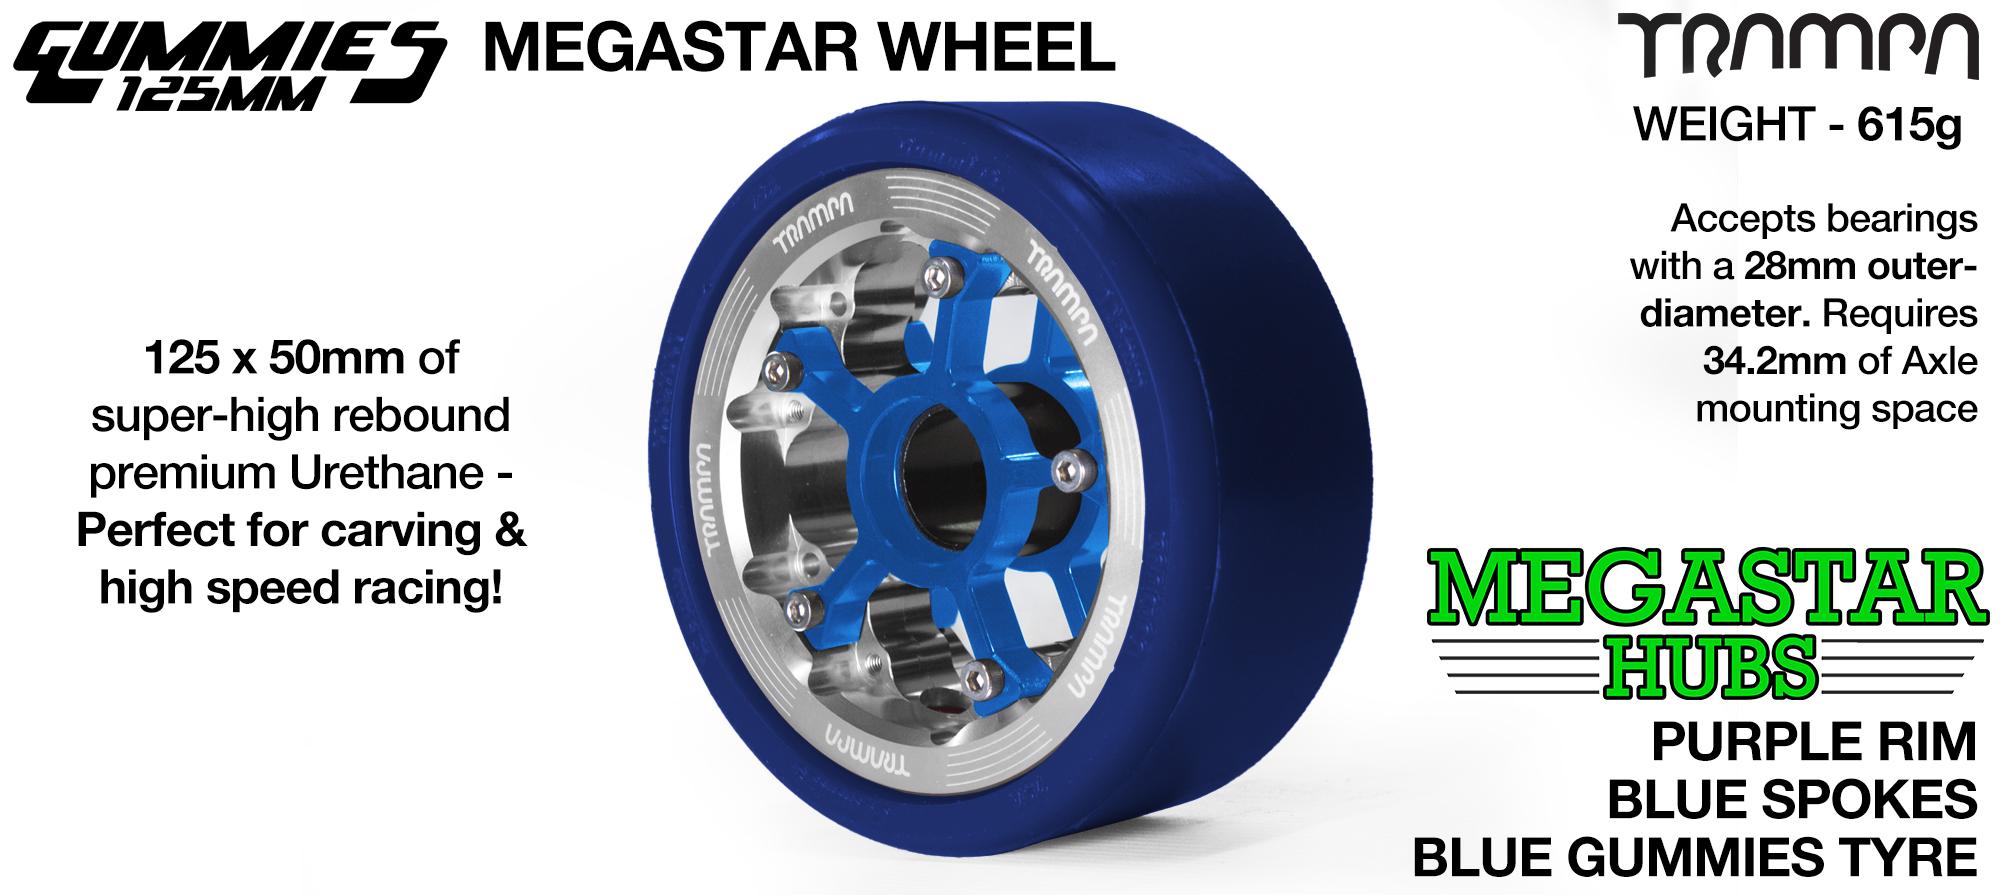 POLISHED MEGASTAR Rim with BLUE Spokes with BLUE Gummies   - The Ulrimate Longboard Wheel